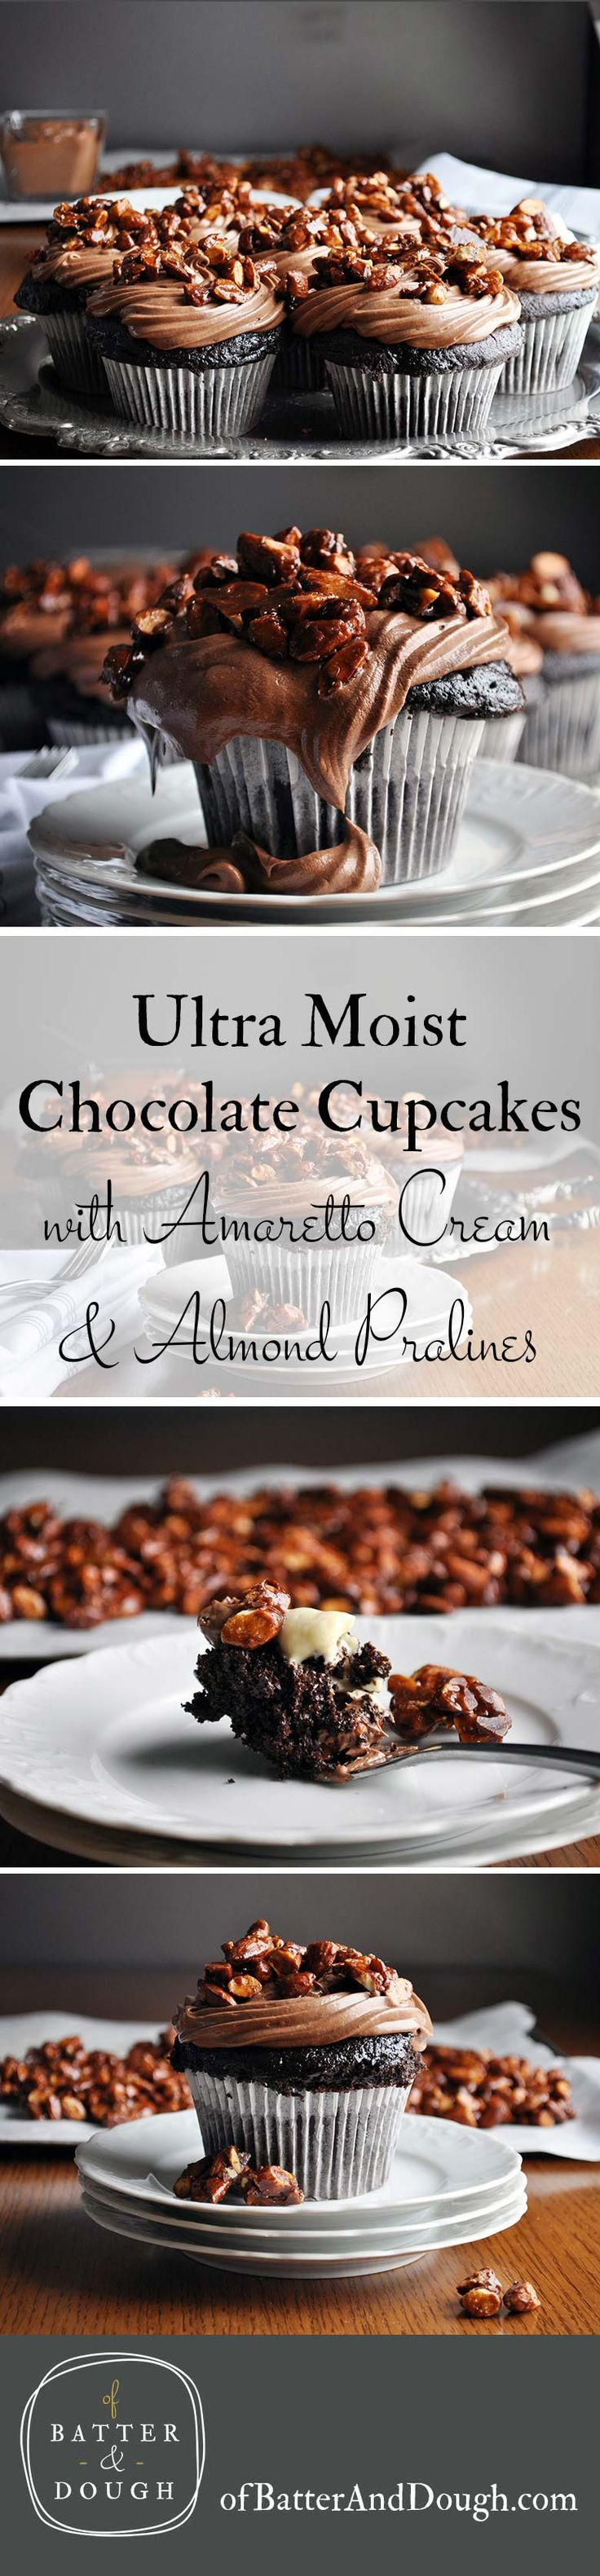 Best chocolate cupcake recipe | ultra moist chocolate cupcake recipe with amaretto pastry cream and almond pralines | ofbatteranddough.com